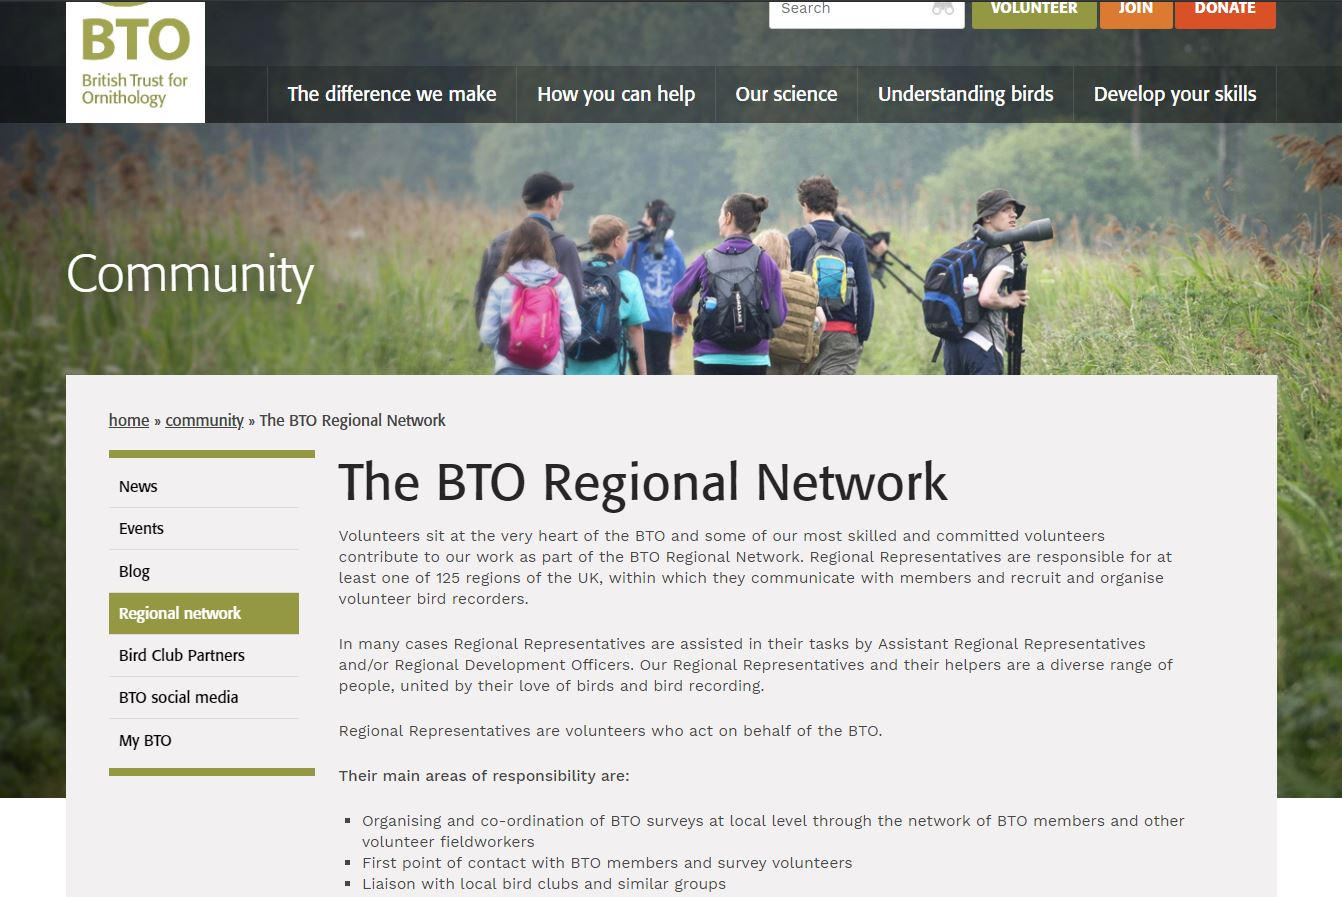 Revised website - Regional Network page